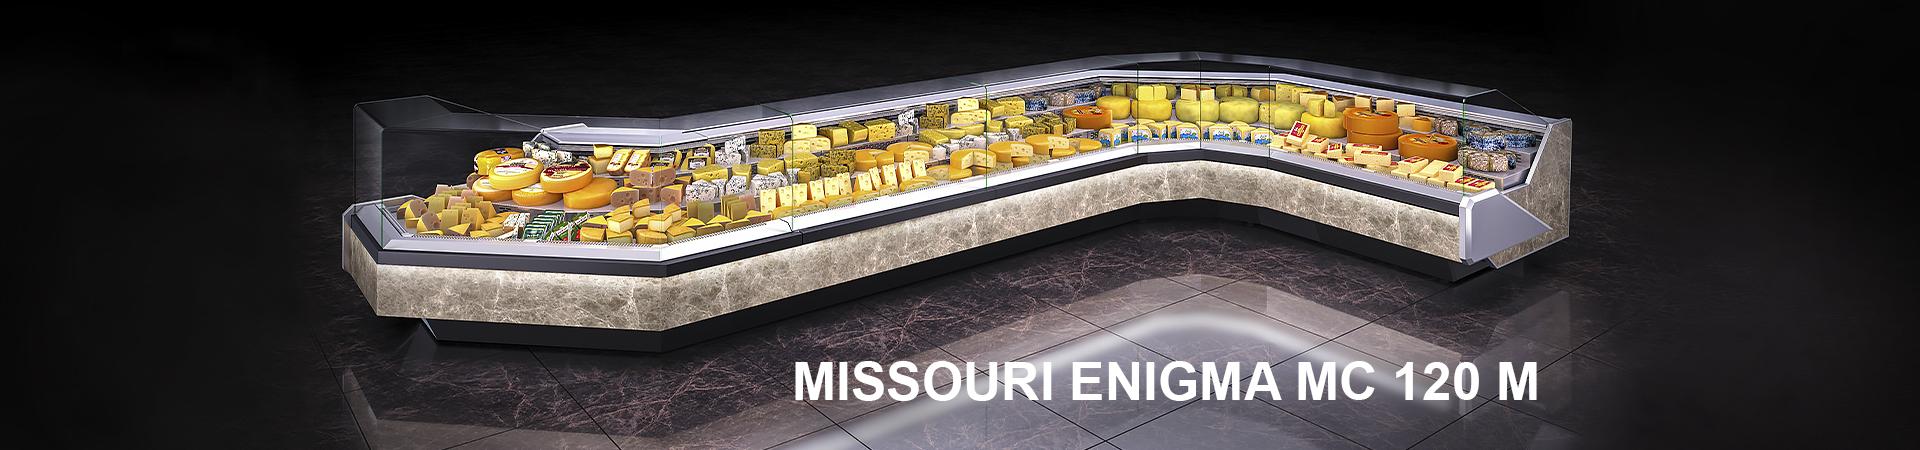 Missouri enigma mk 120 M